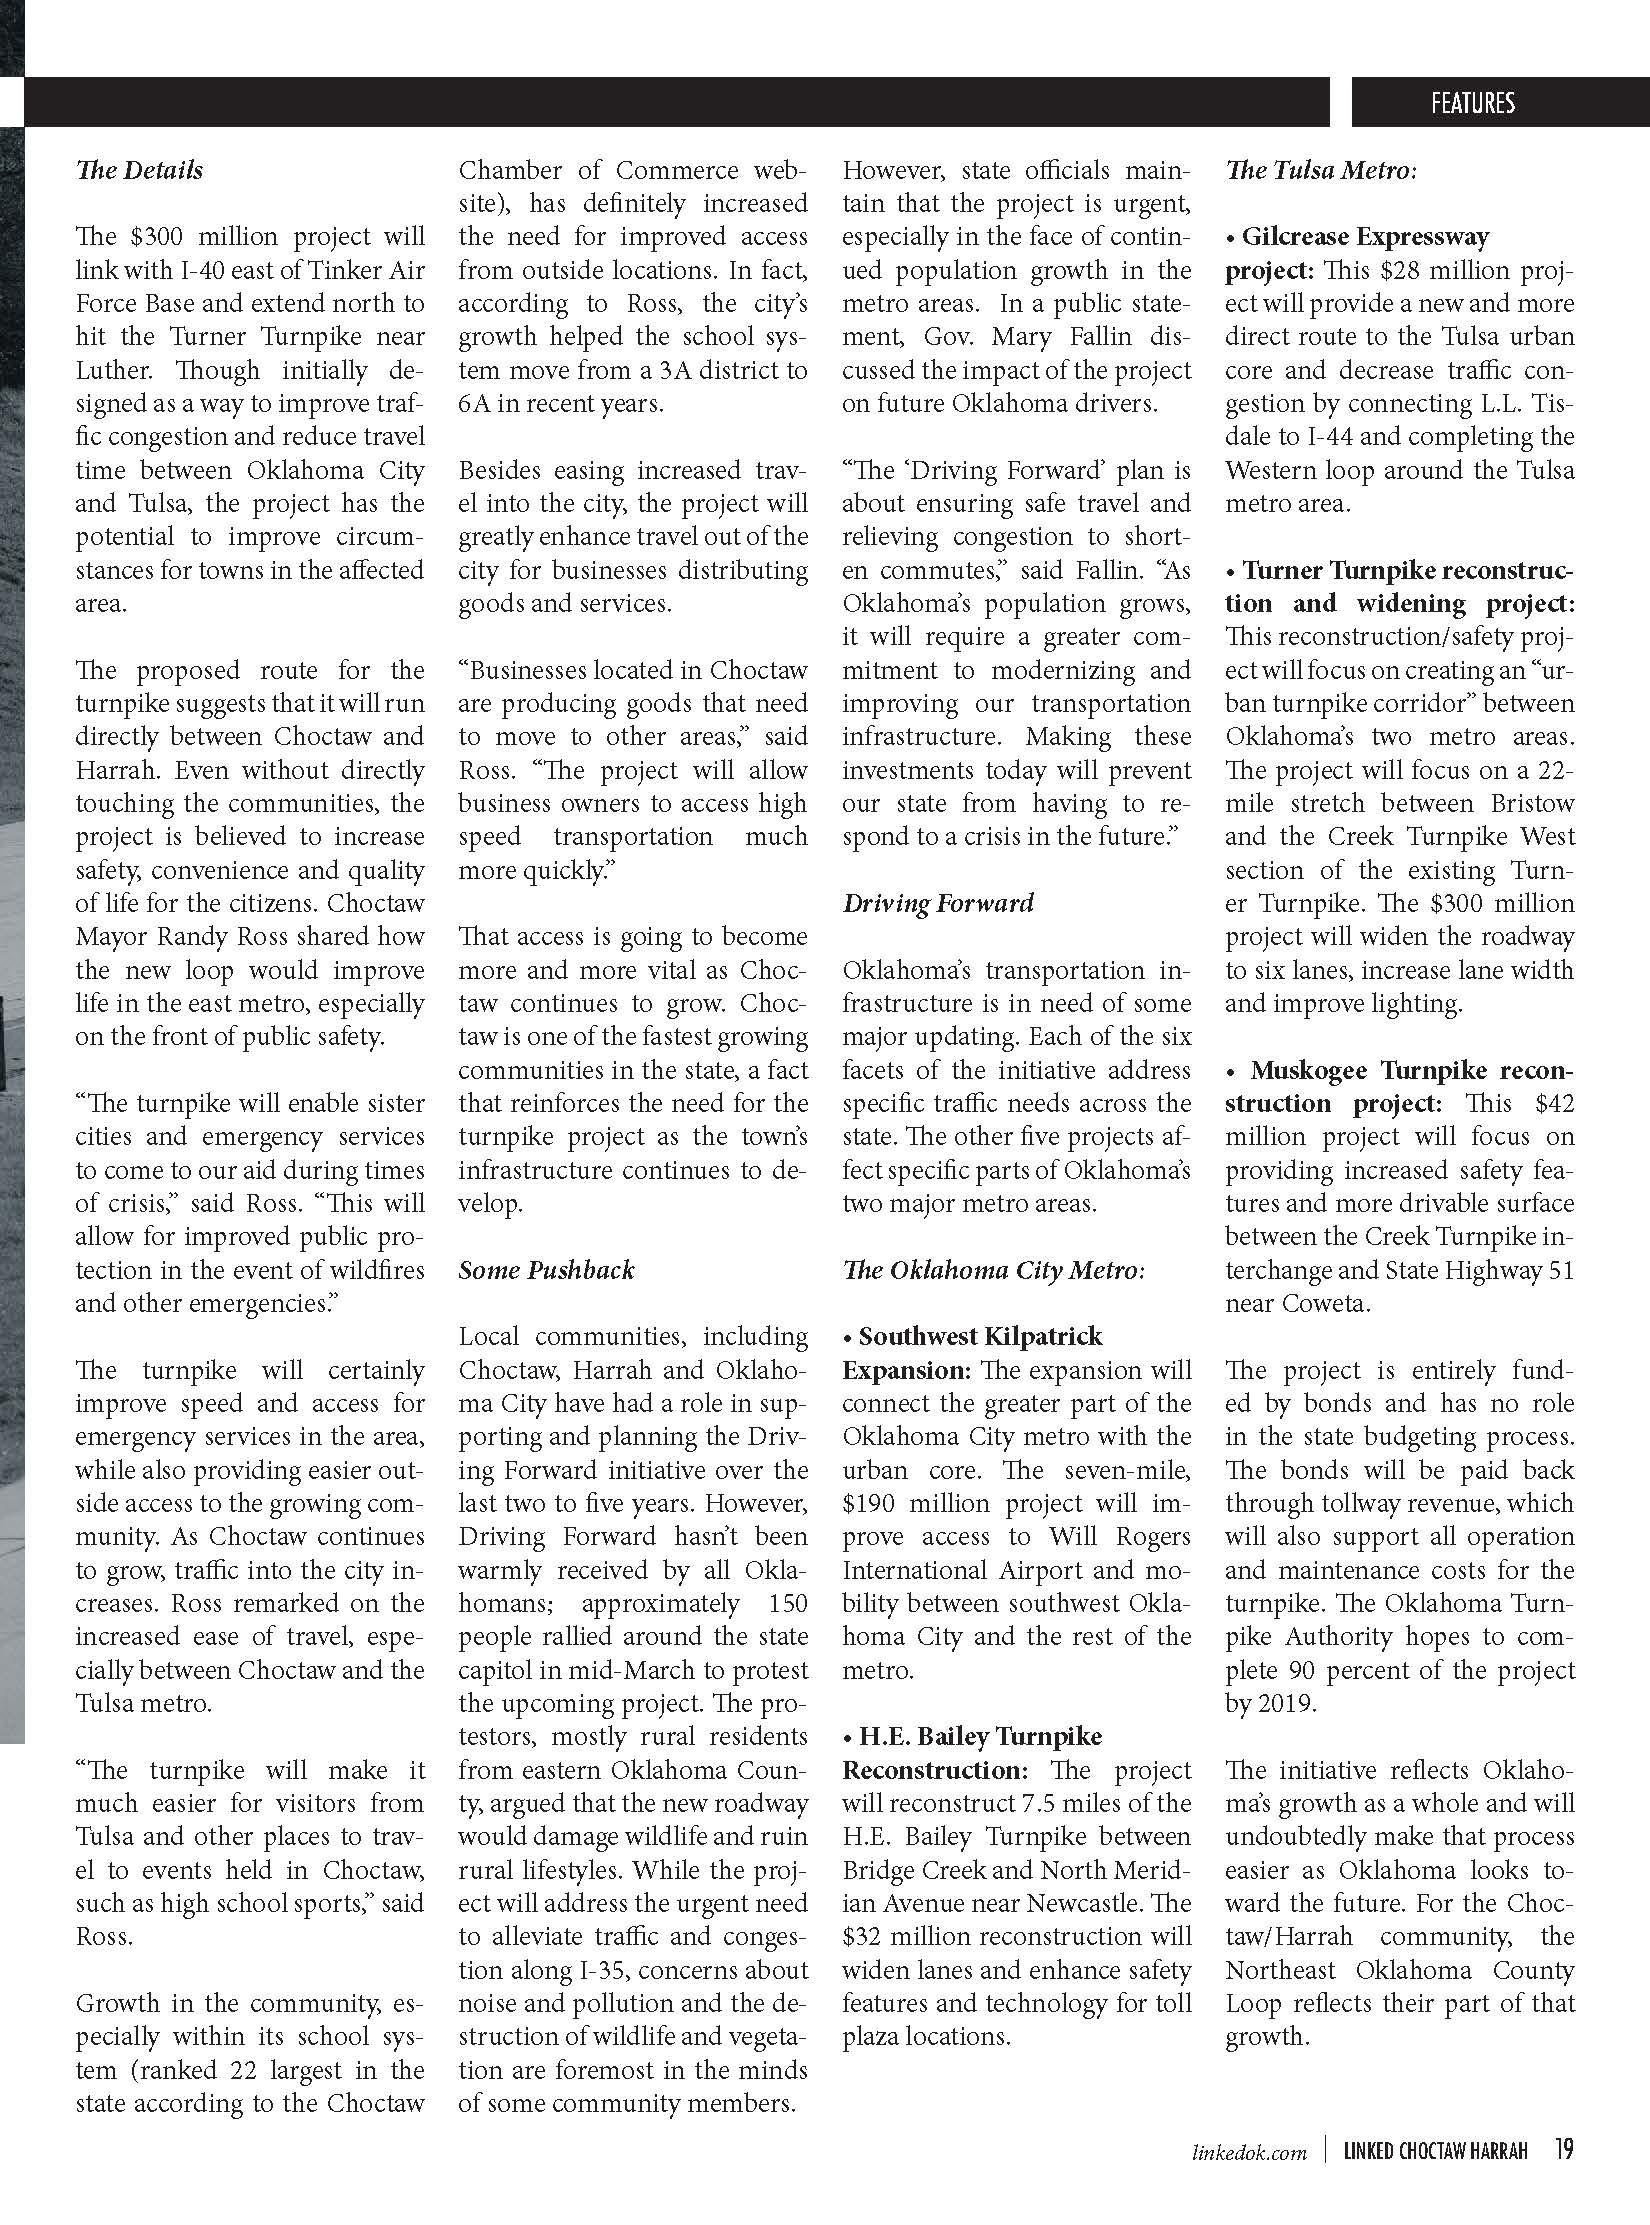 High Five_Choctaw Harrah_April 2016_Page_19.jpg